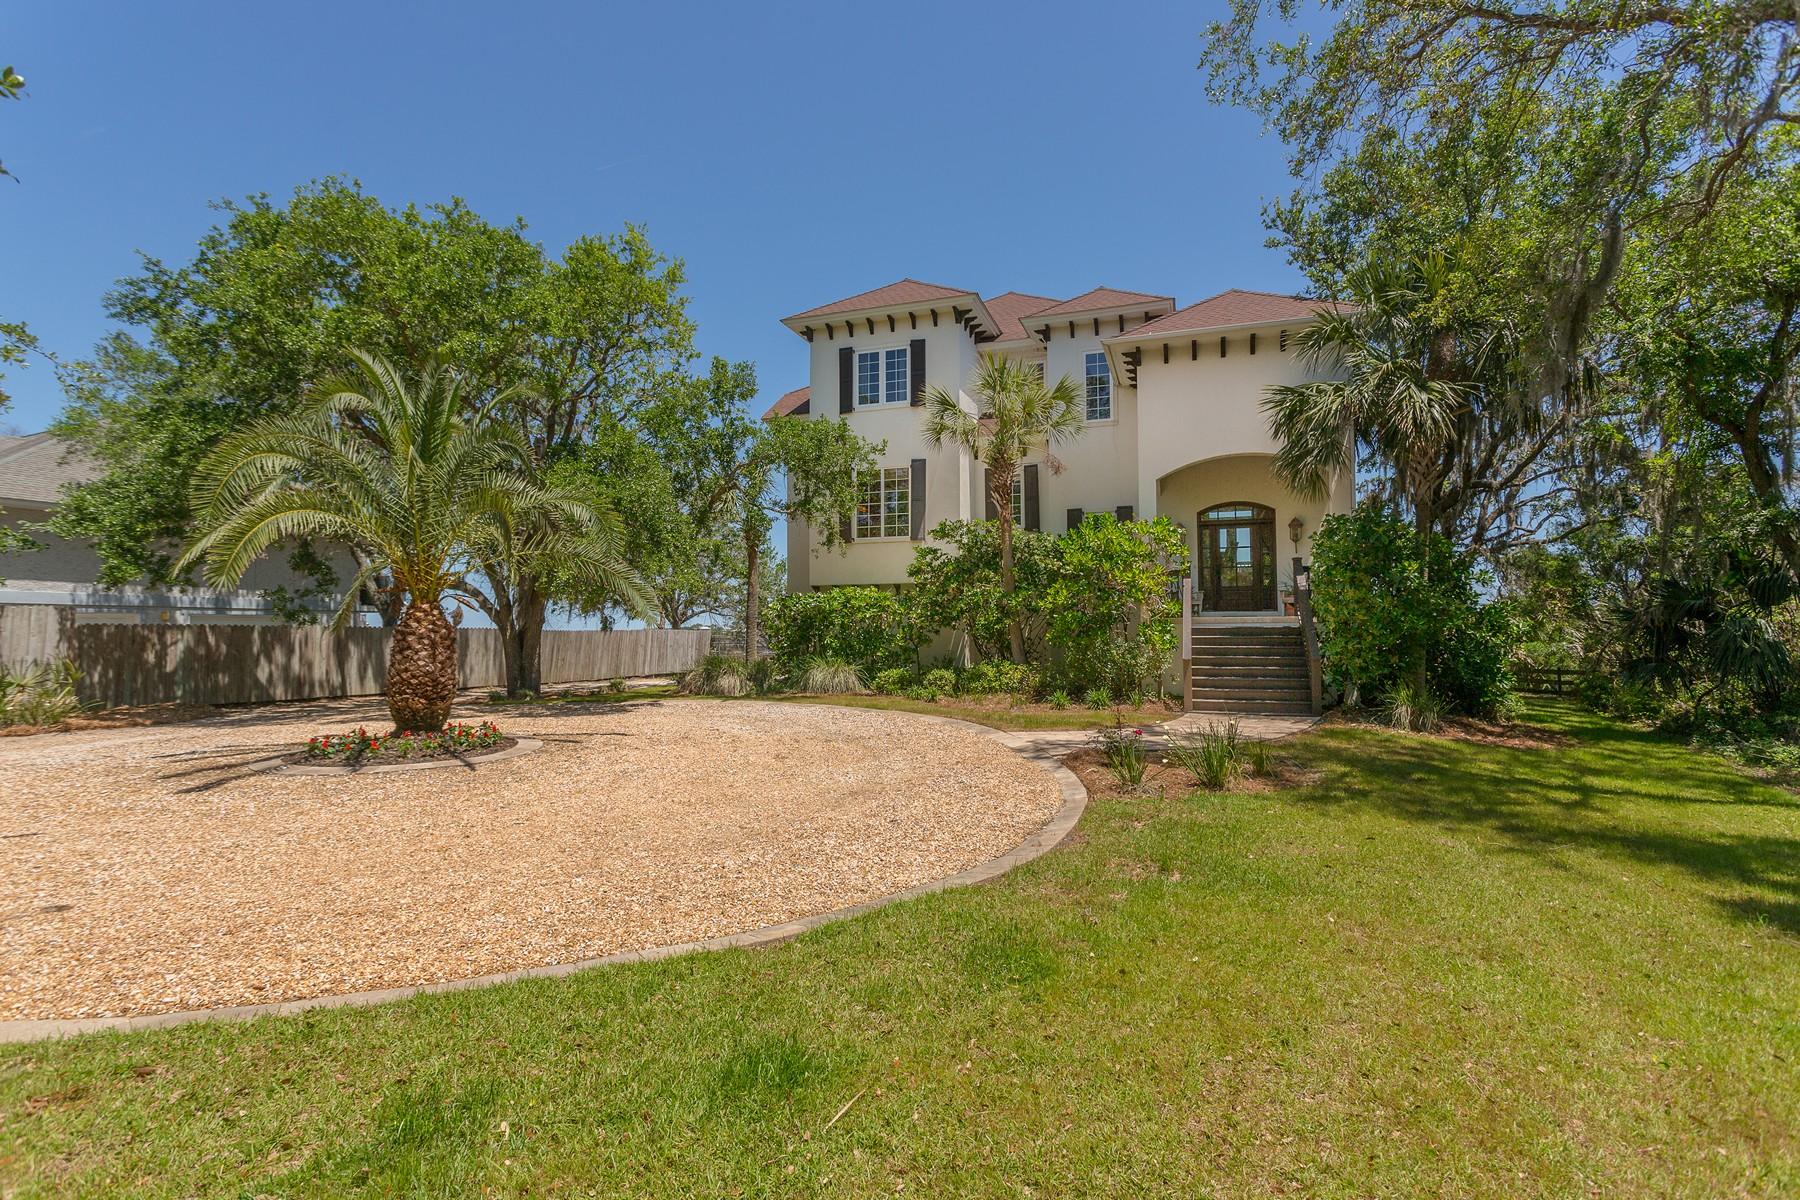 獨棟家庭住宅 為 出售 在 16 Yucca Lane 16 Yucca Lane St. Simons Island, 喬治亞州 31522 美國